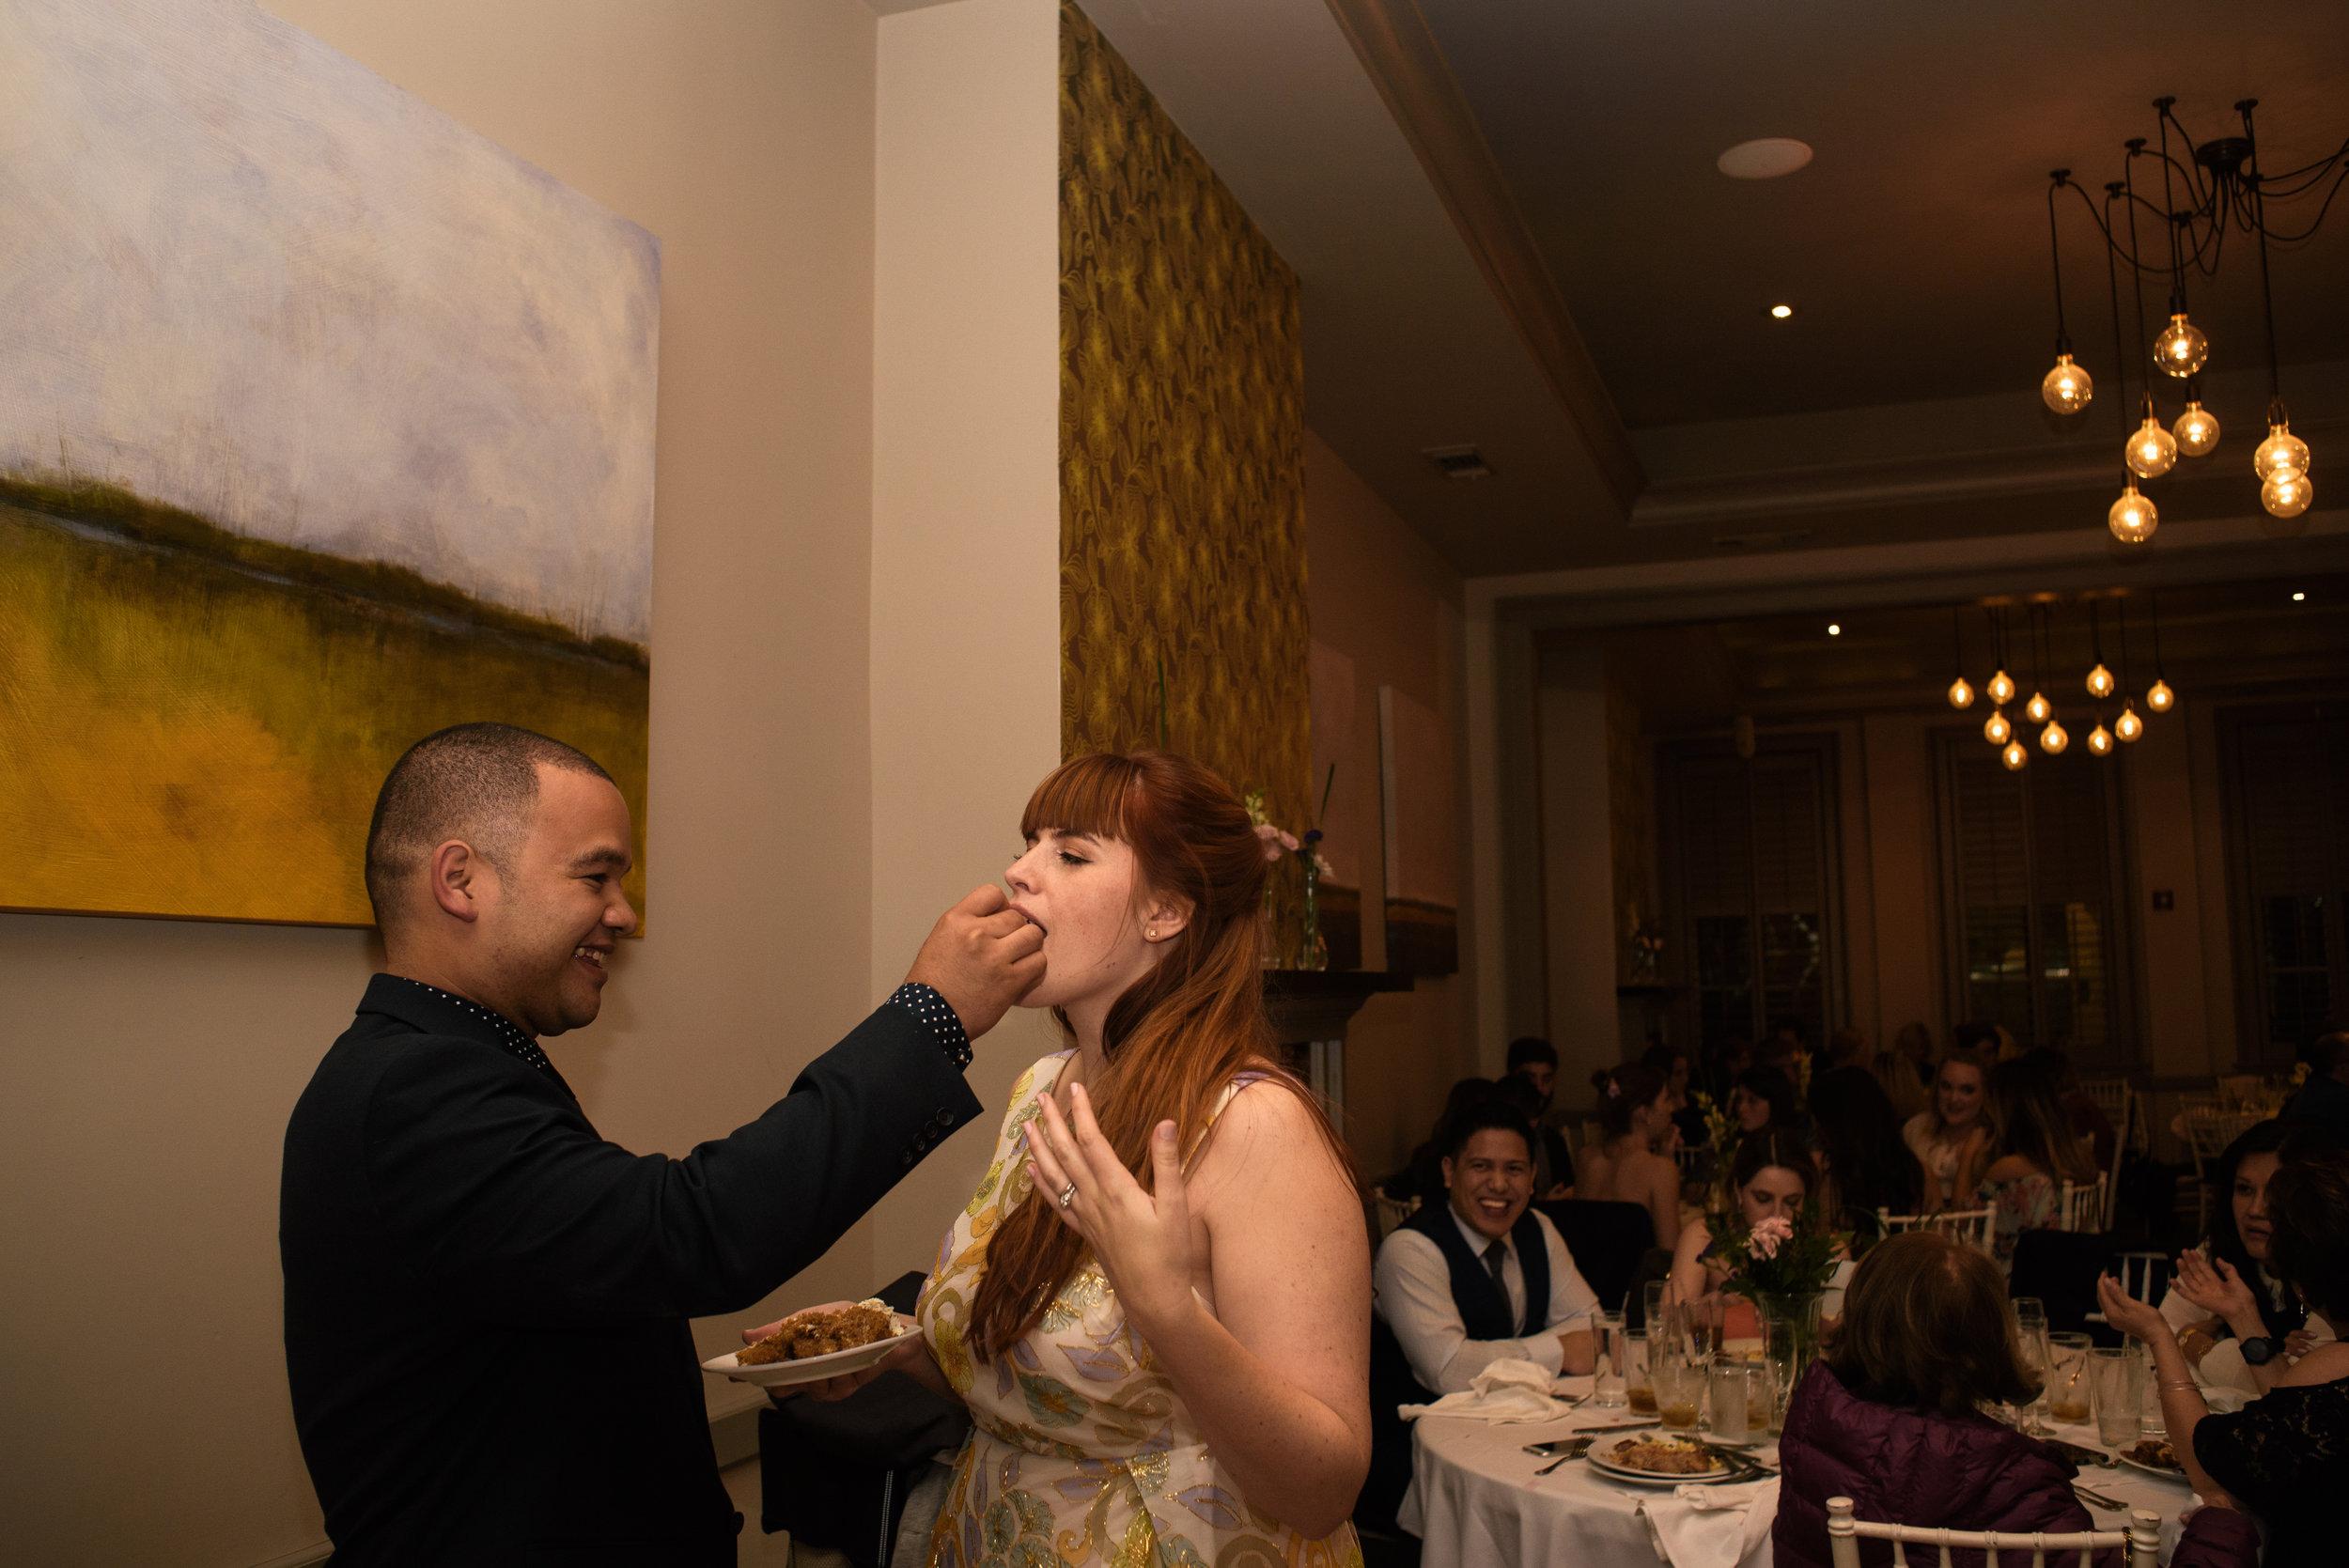 savannah-elopement-photography-savannah-georgia-elopement-photographer-savannah-wedding-photographer-meg-hill-photo-jade-hill- (56 of 58).jpg